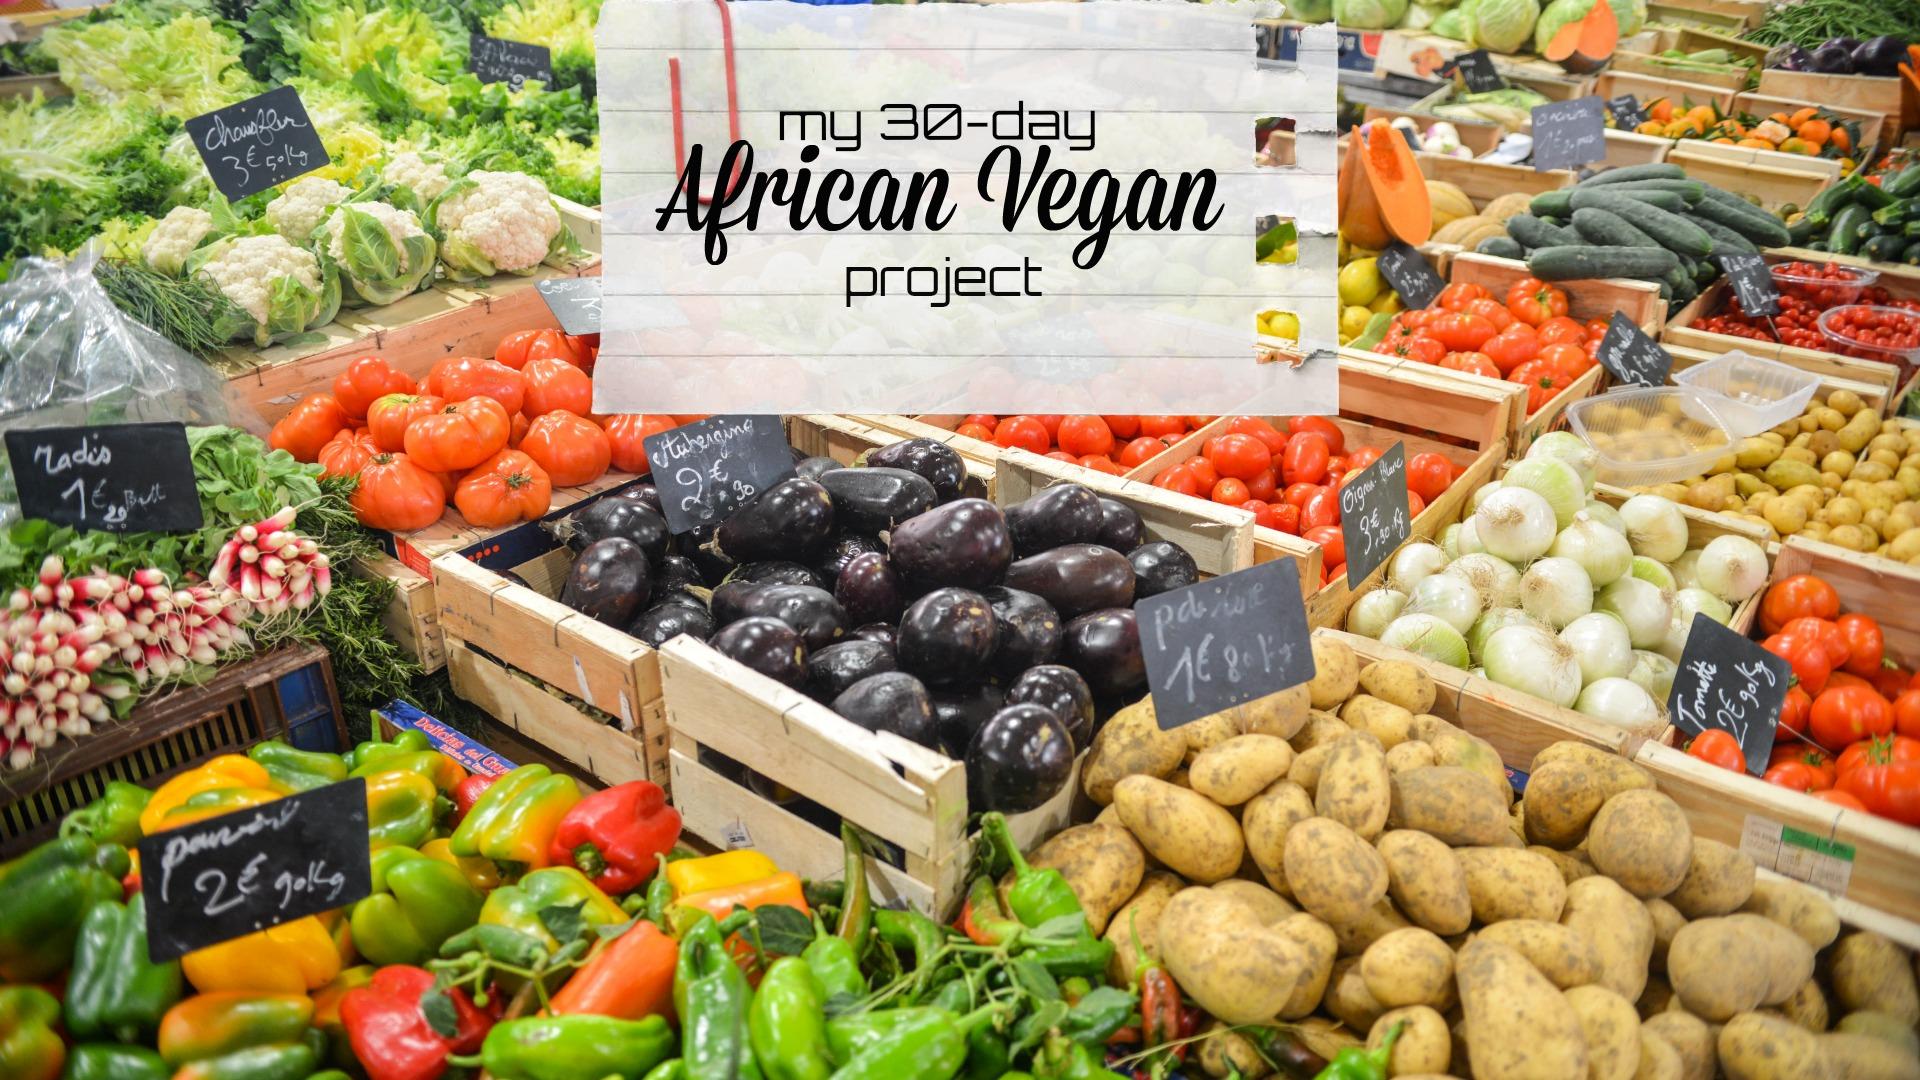 african-vegan-project